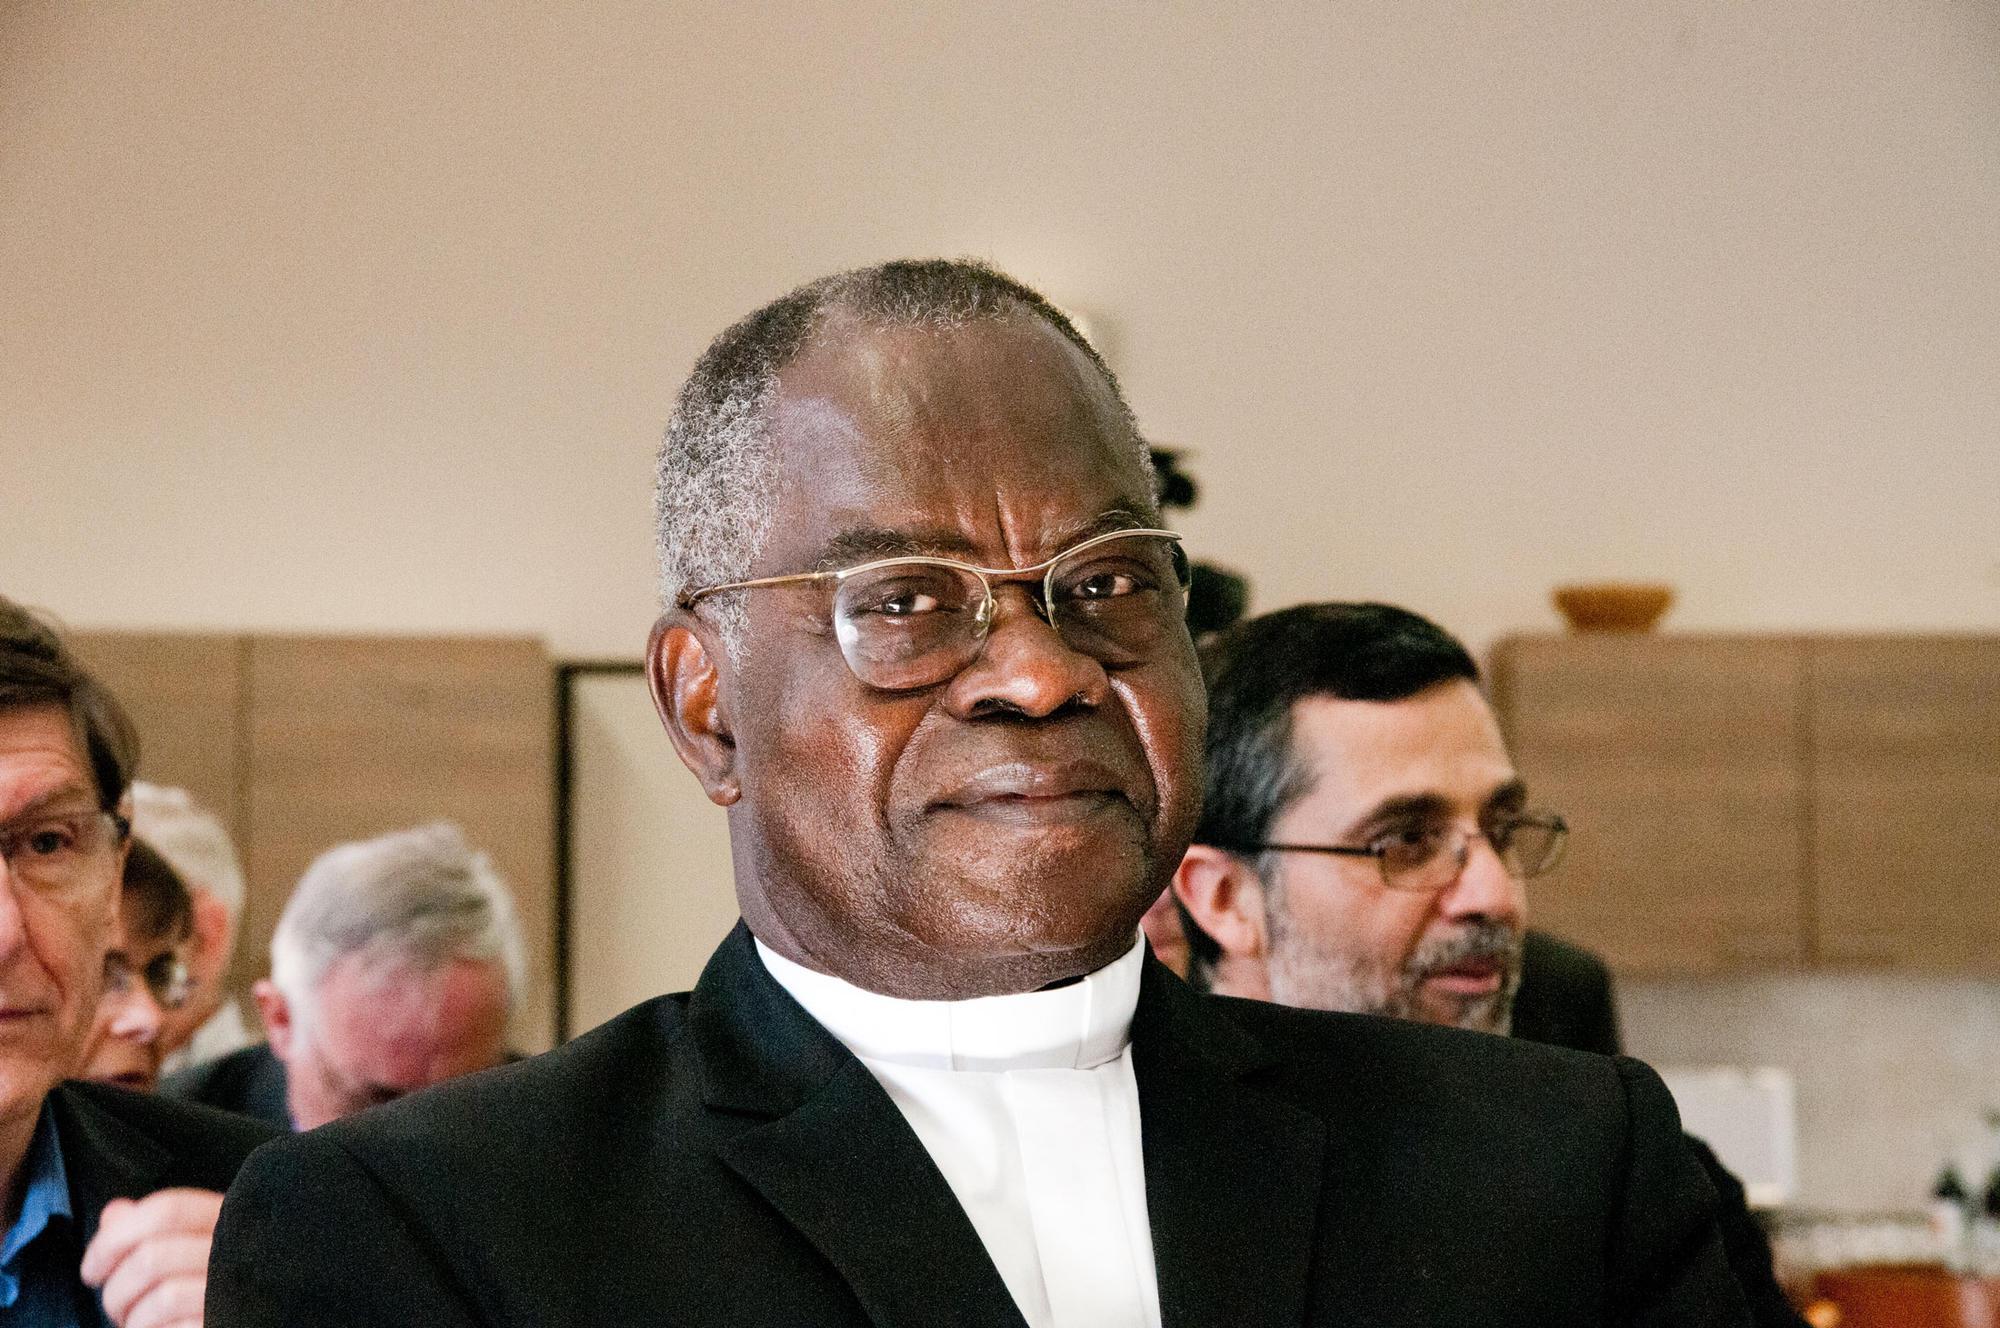 Kardinaal Laurent Monsengwo Pasinya © Philippe Keulemans